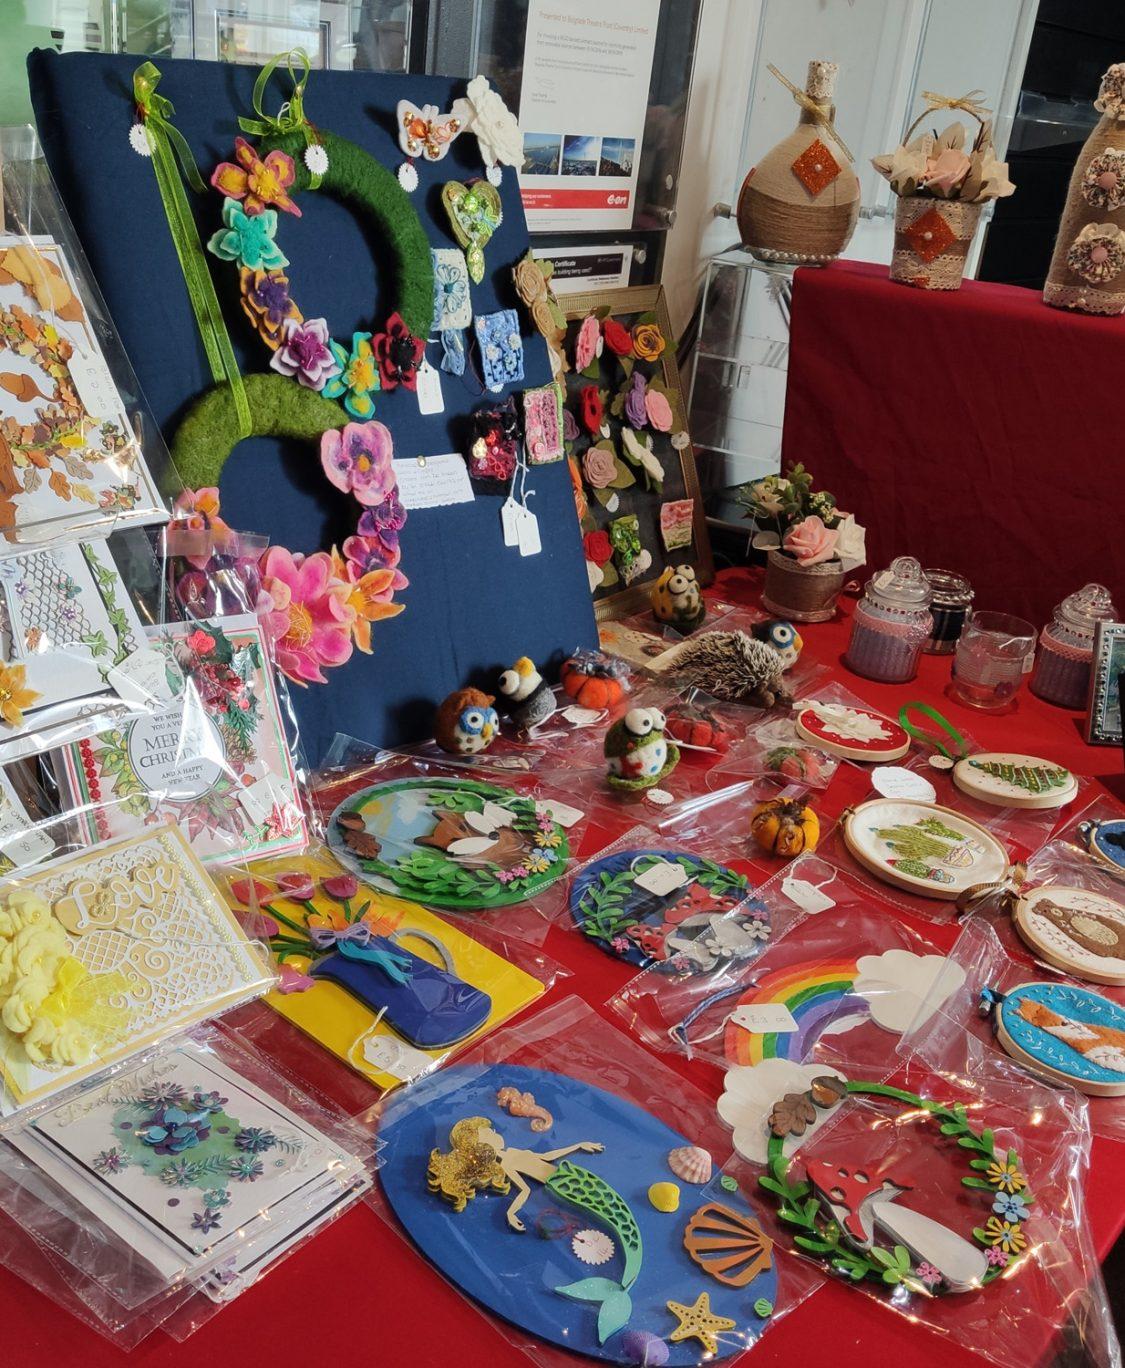 Pop-up craft shop opens at the Belgrade